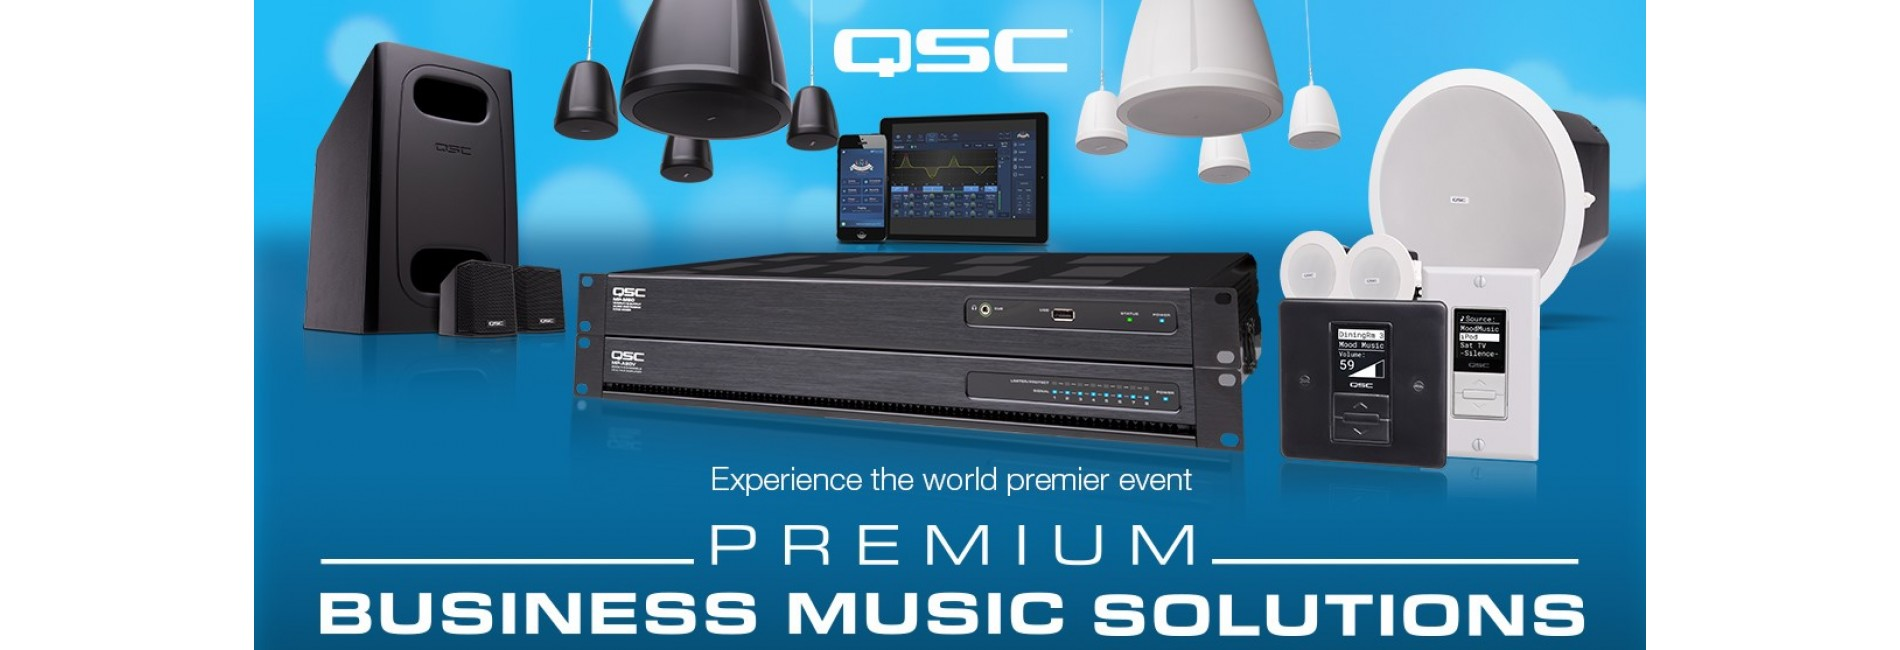 QSC Premium Business Music Solutions